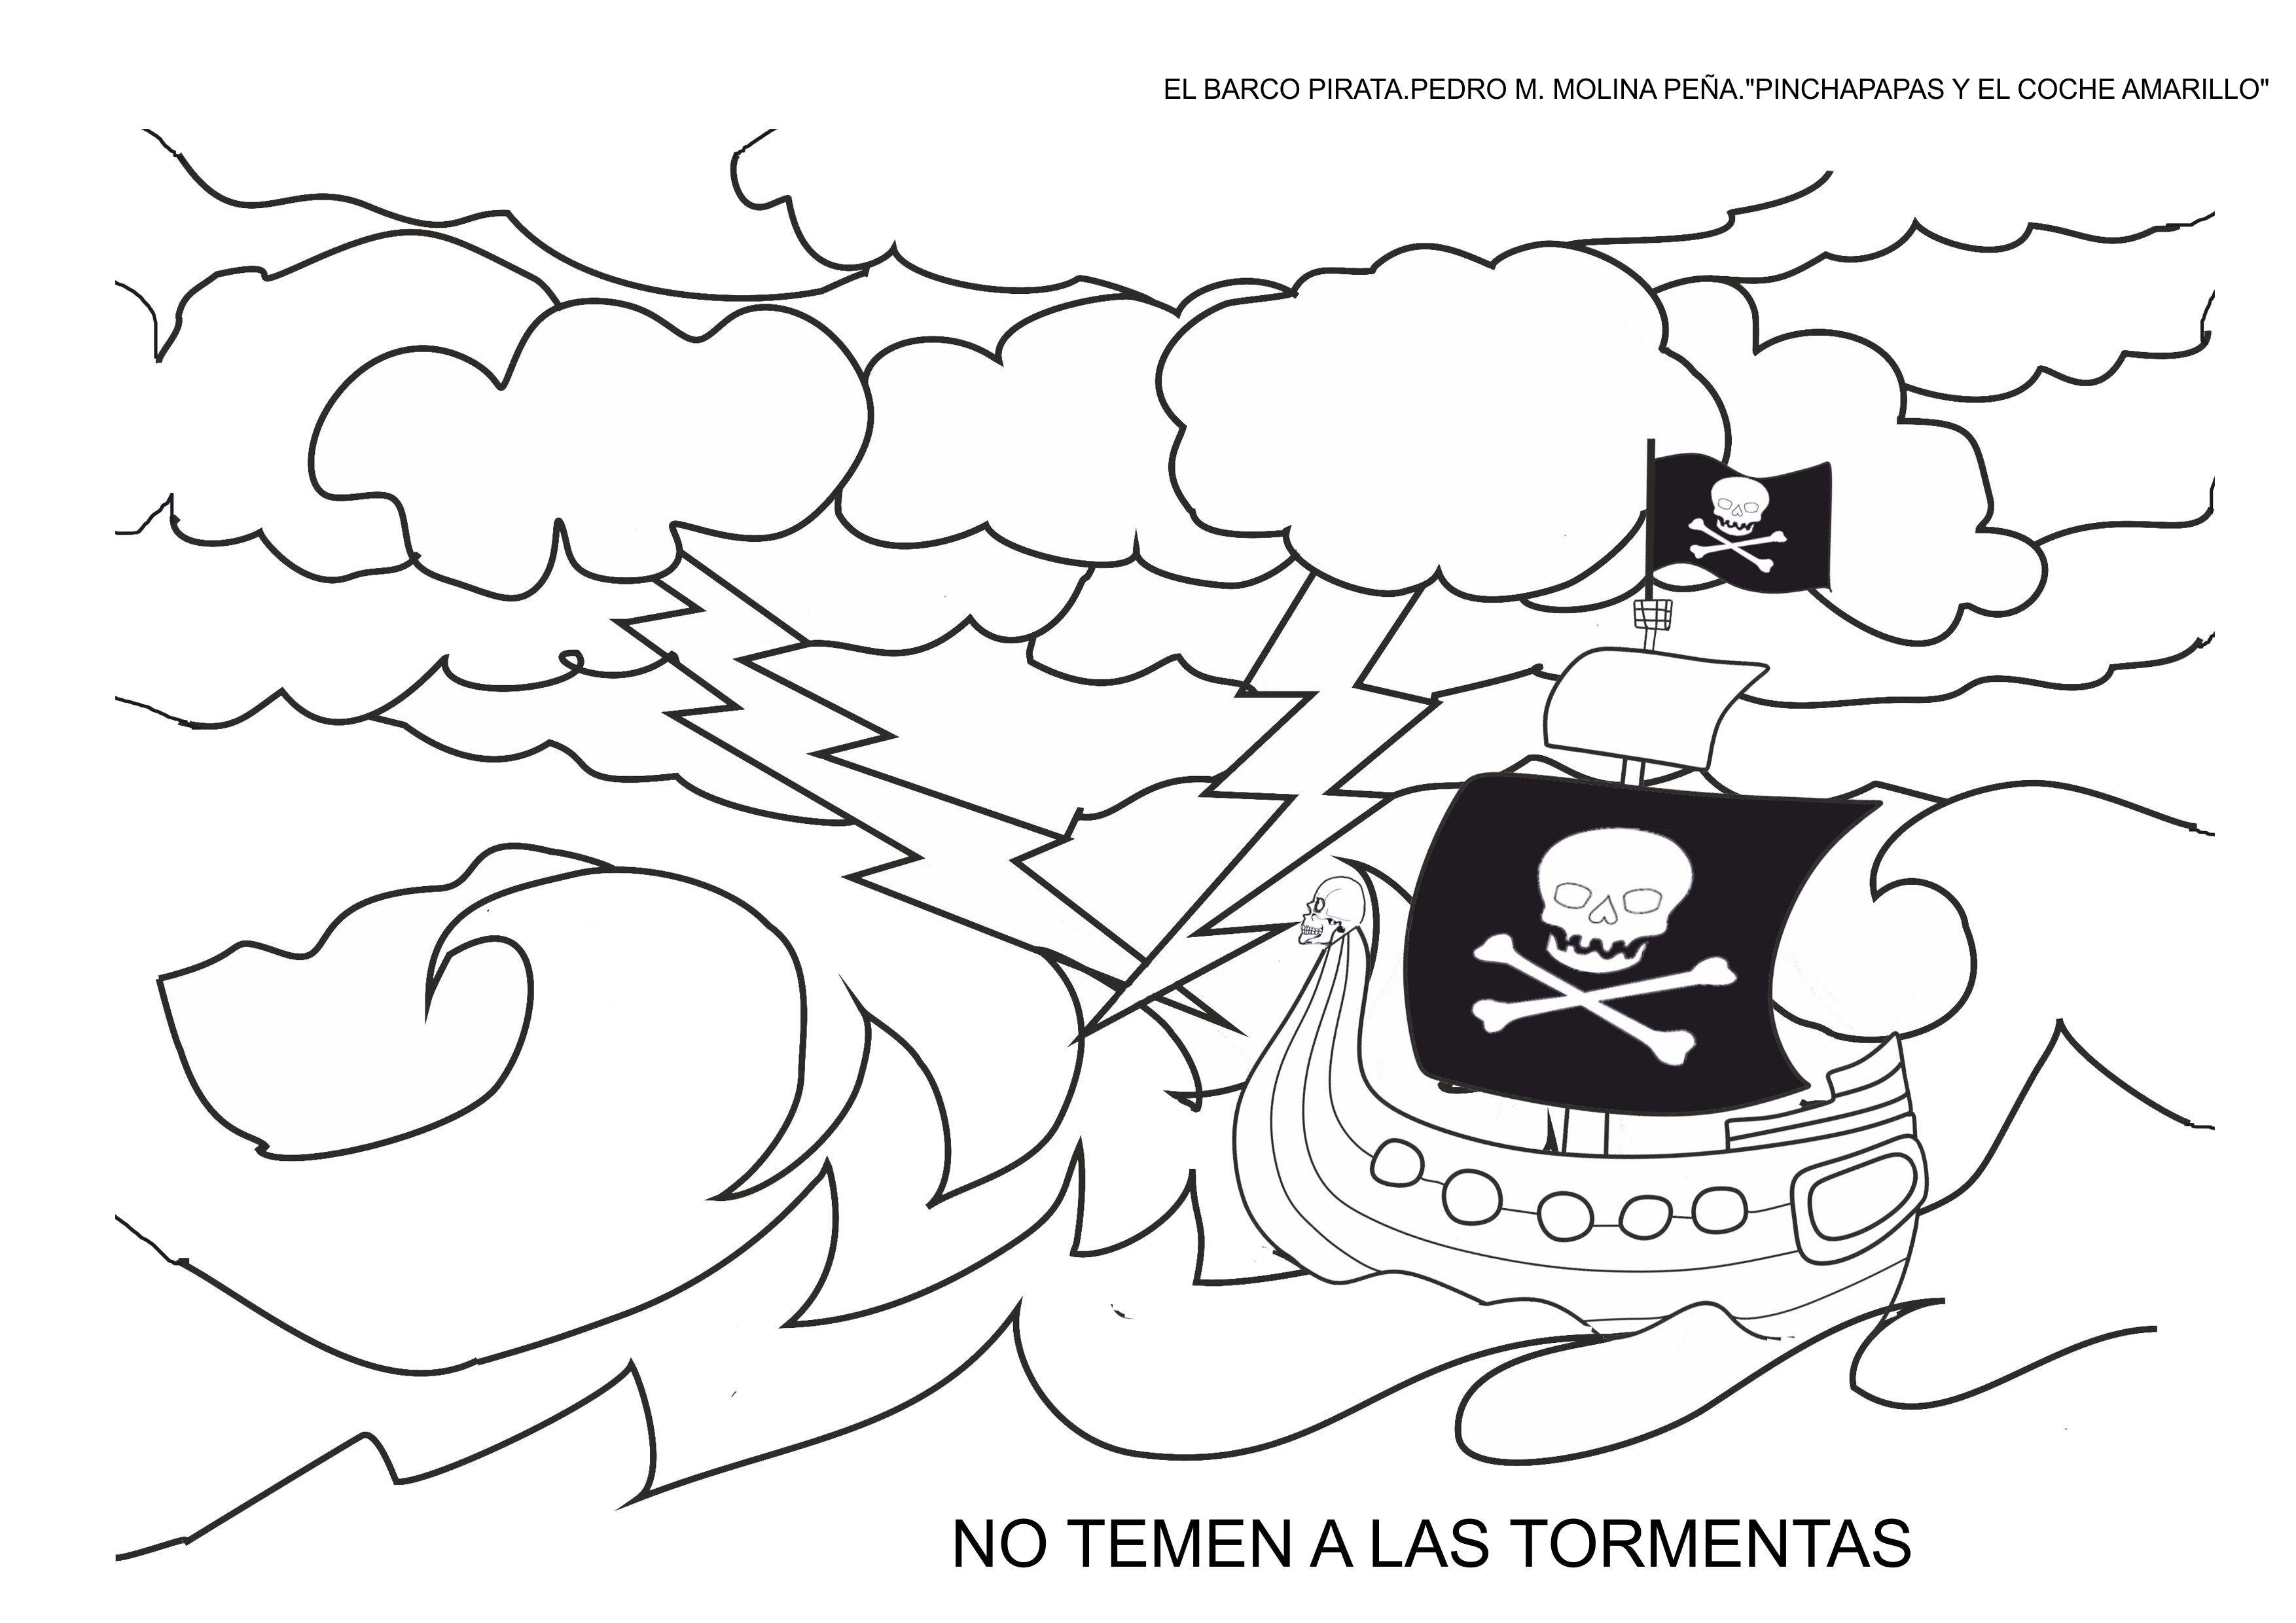 Encantador Piratas De Béisbol Para Colorear Imagen - Enmarcado Para ...